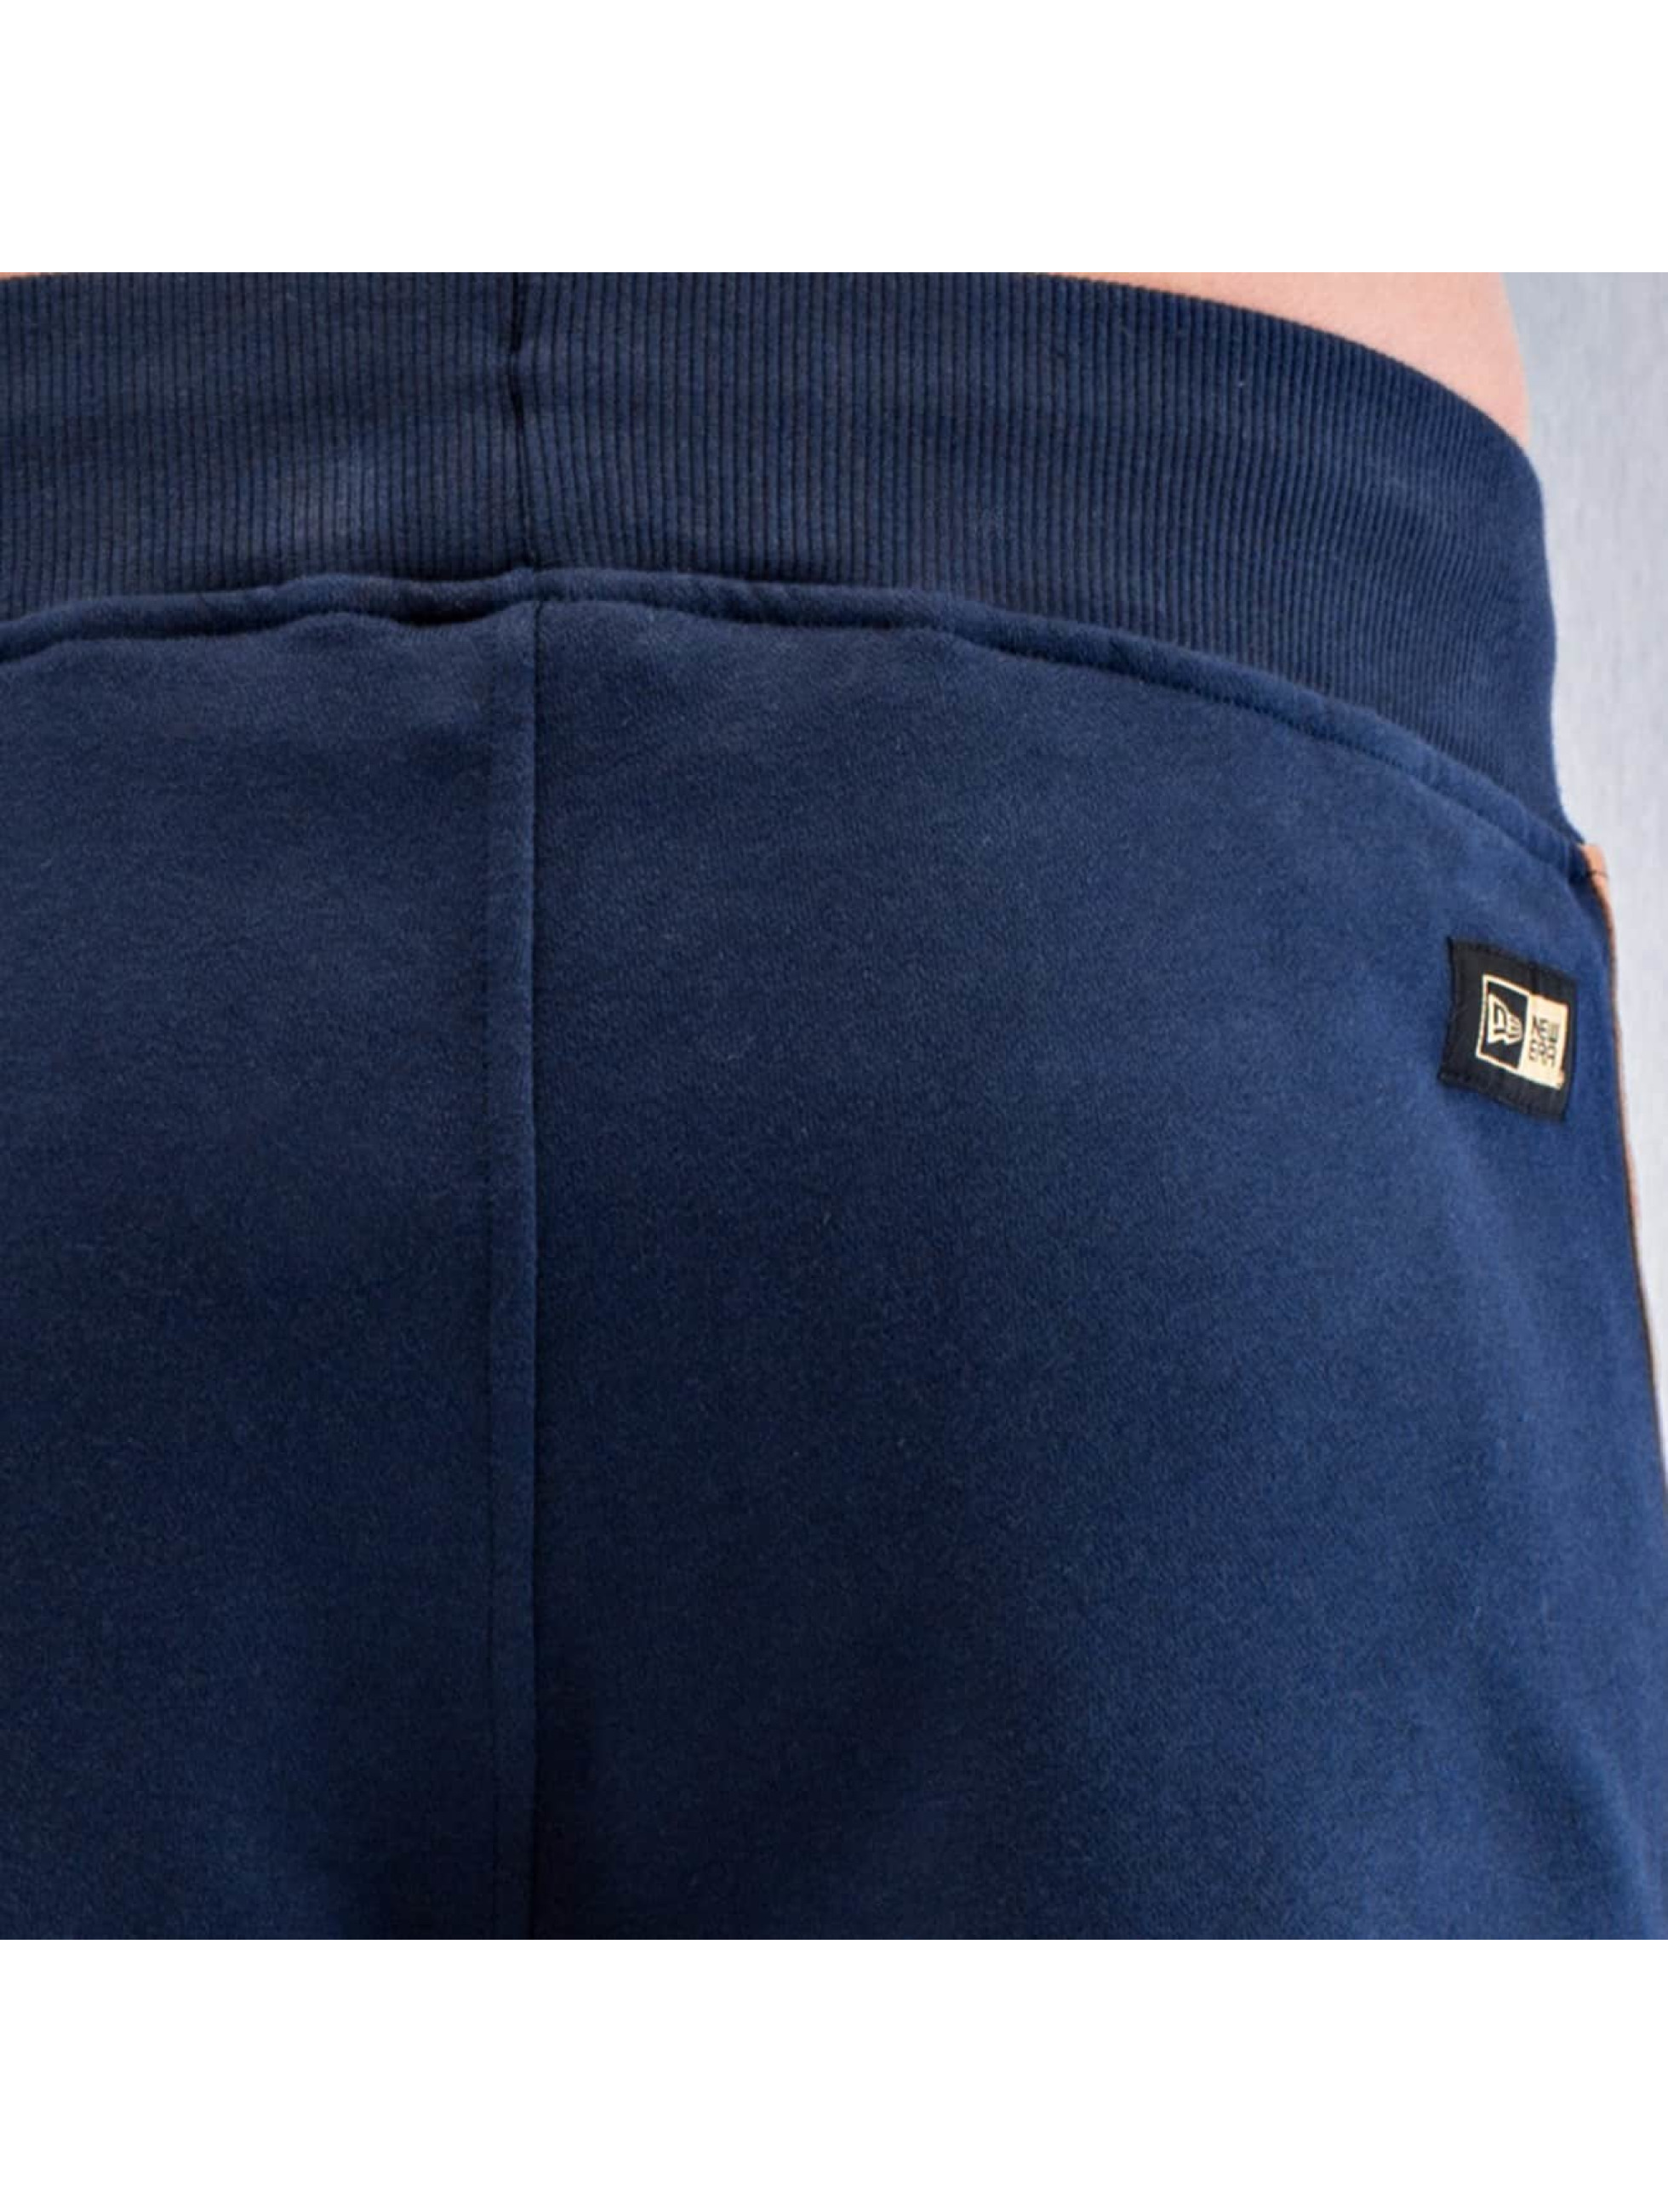 New Era Спортивные брюки Crafted синий